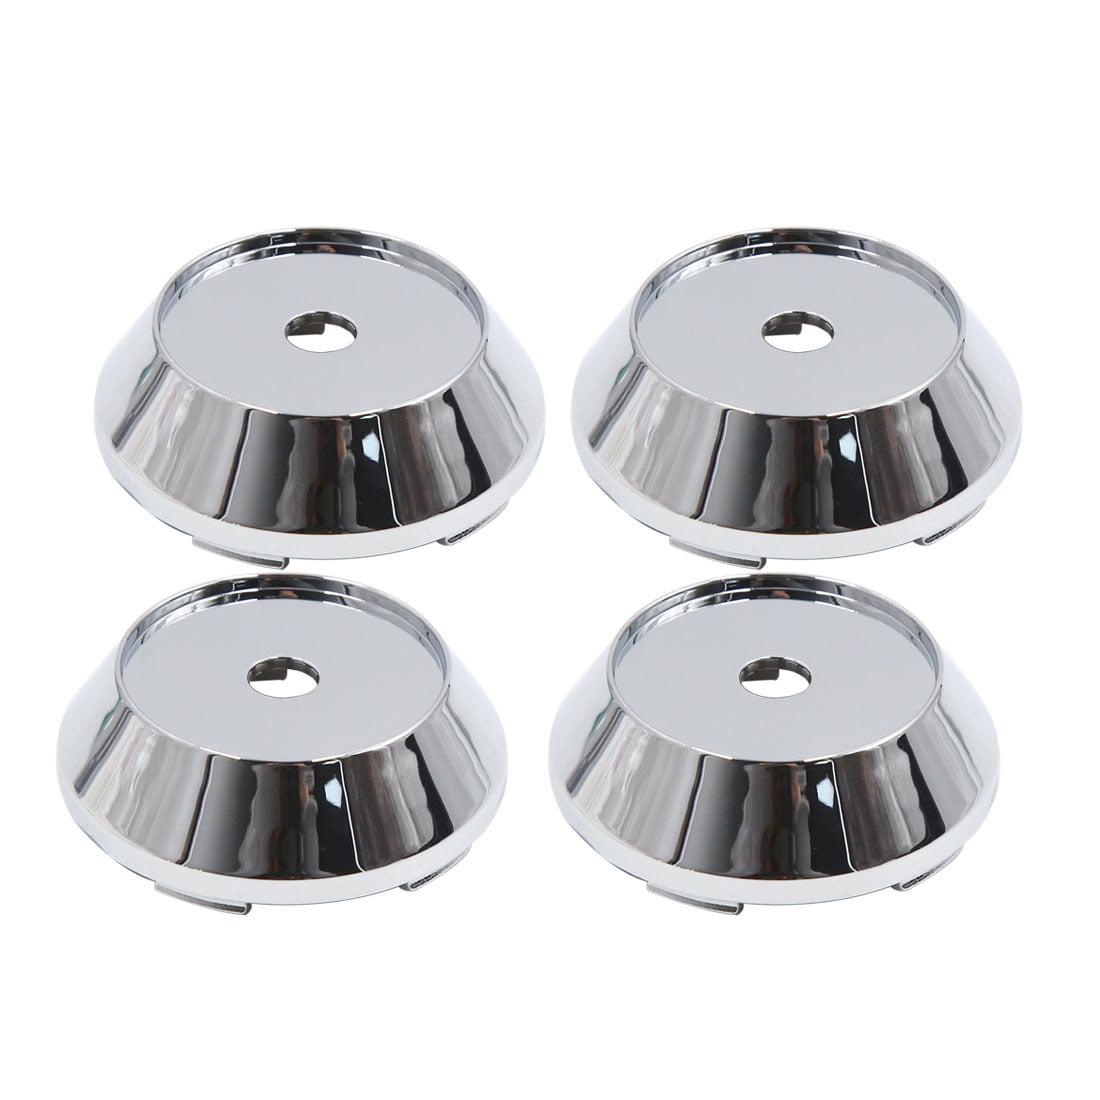 4pcs 65mm Dia 5 Clips Car Wheel Tyre Center Hub Caps Covers Protector Chrome